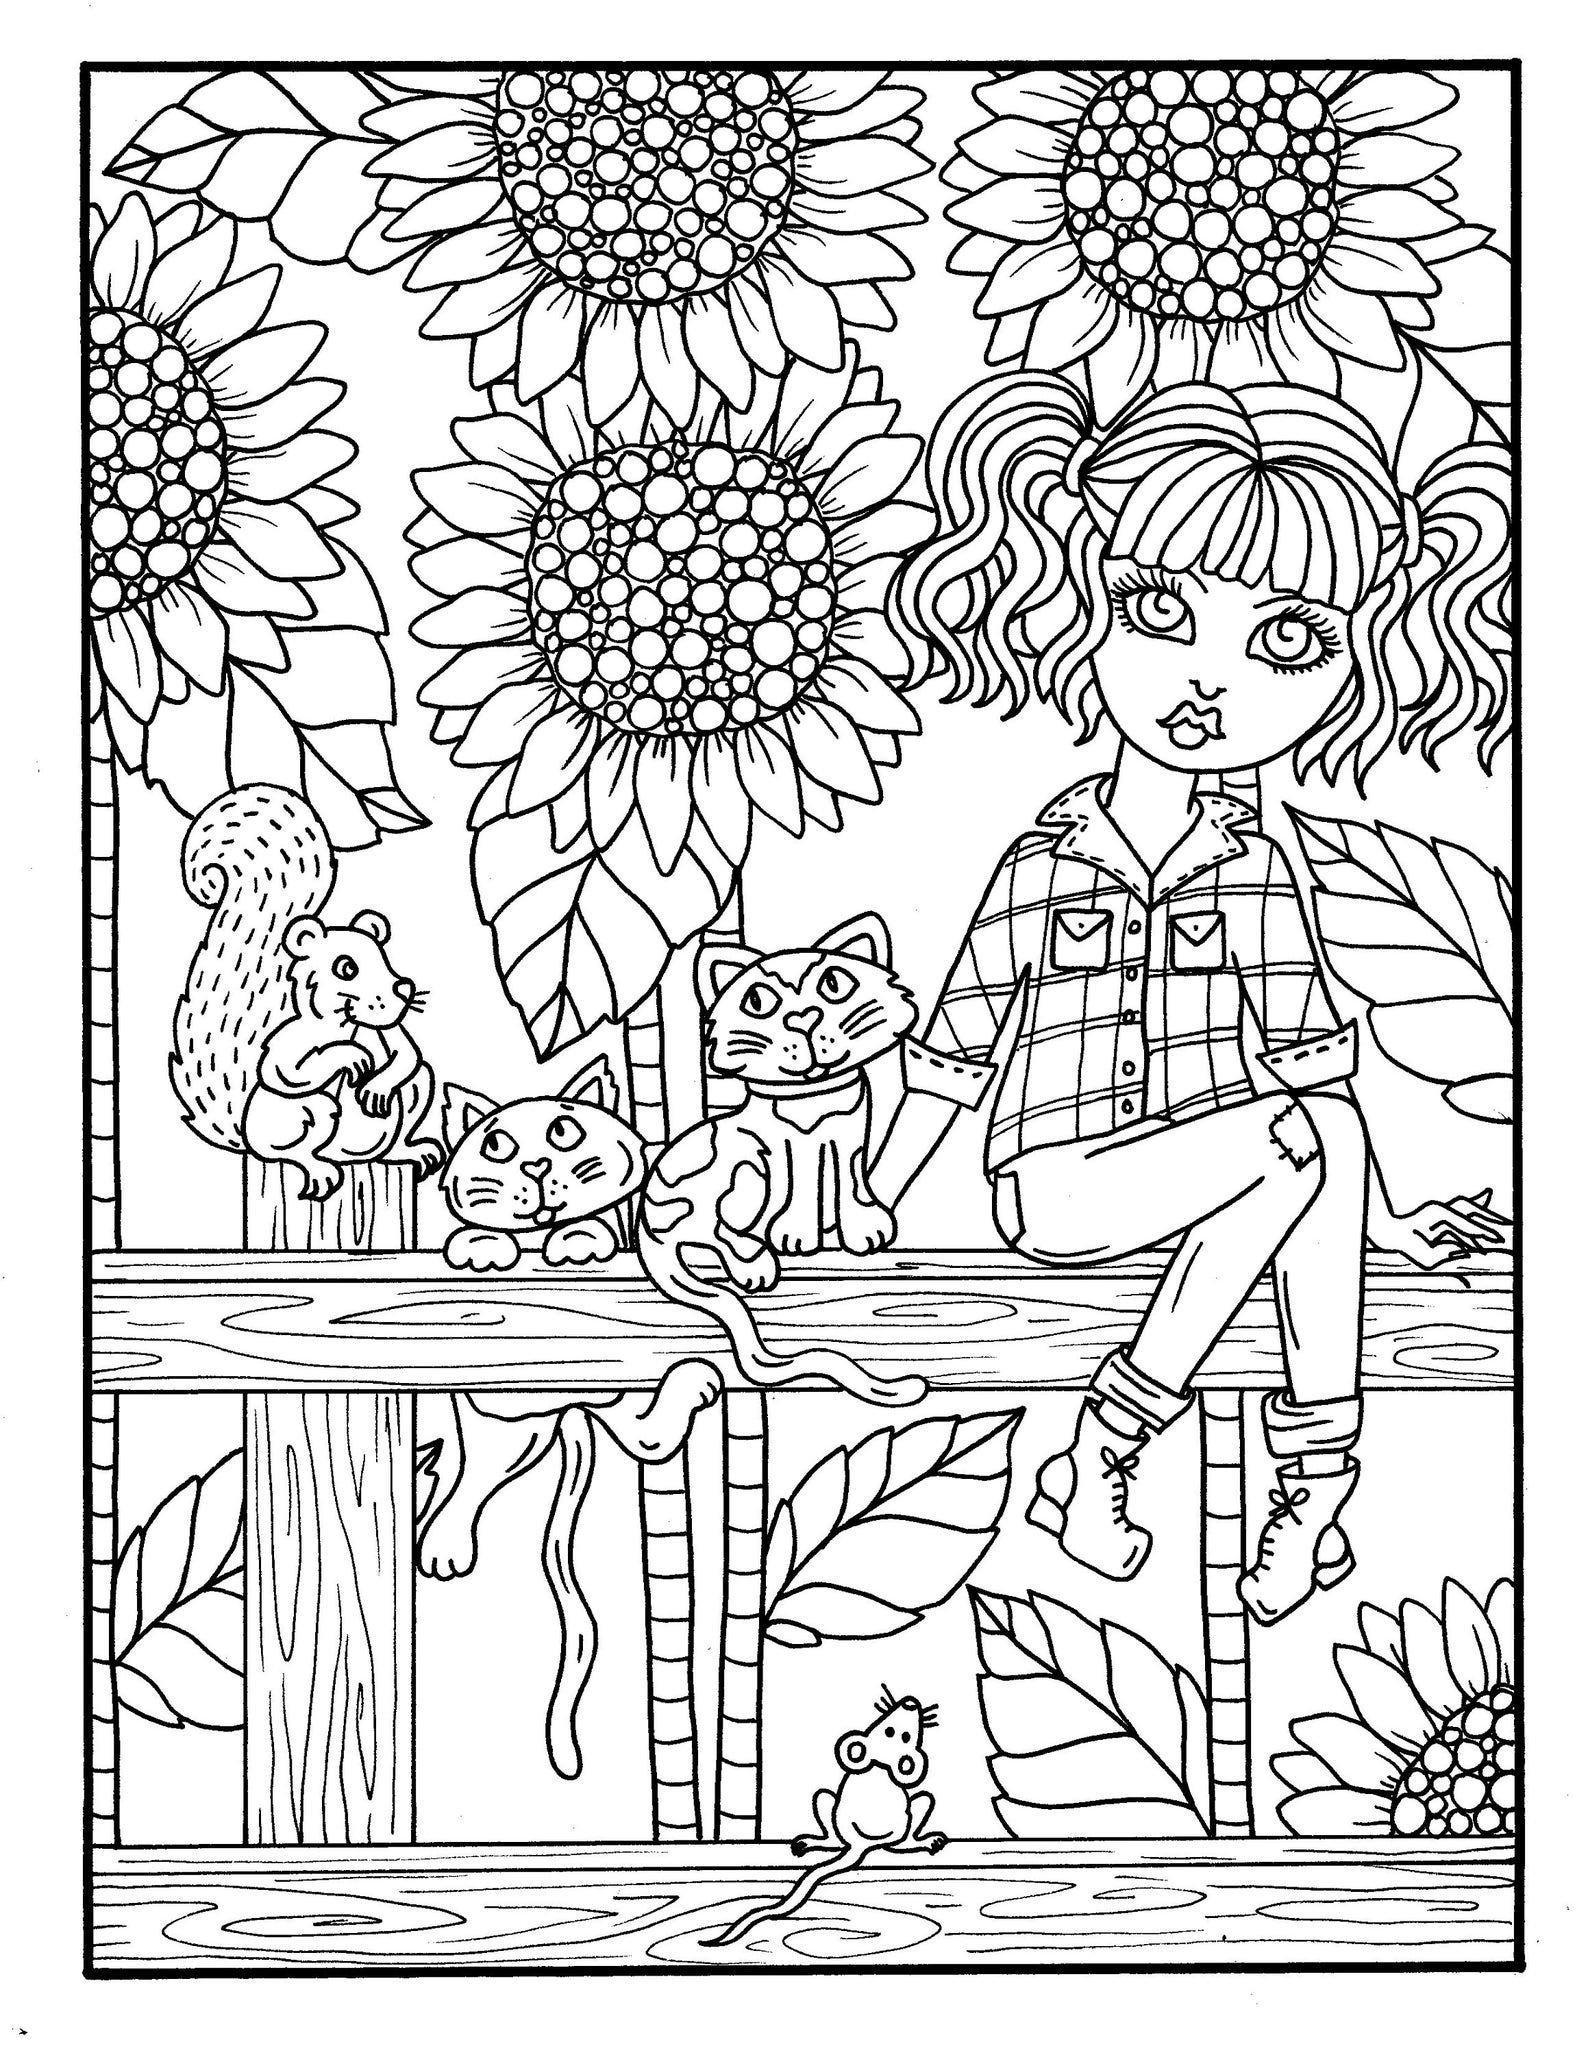 Fall Friends Digital Coloring Book Fun Fall Girls And